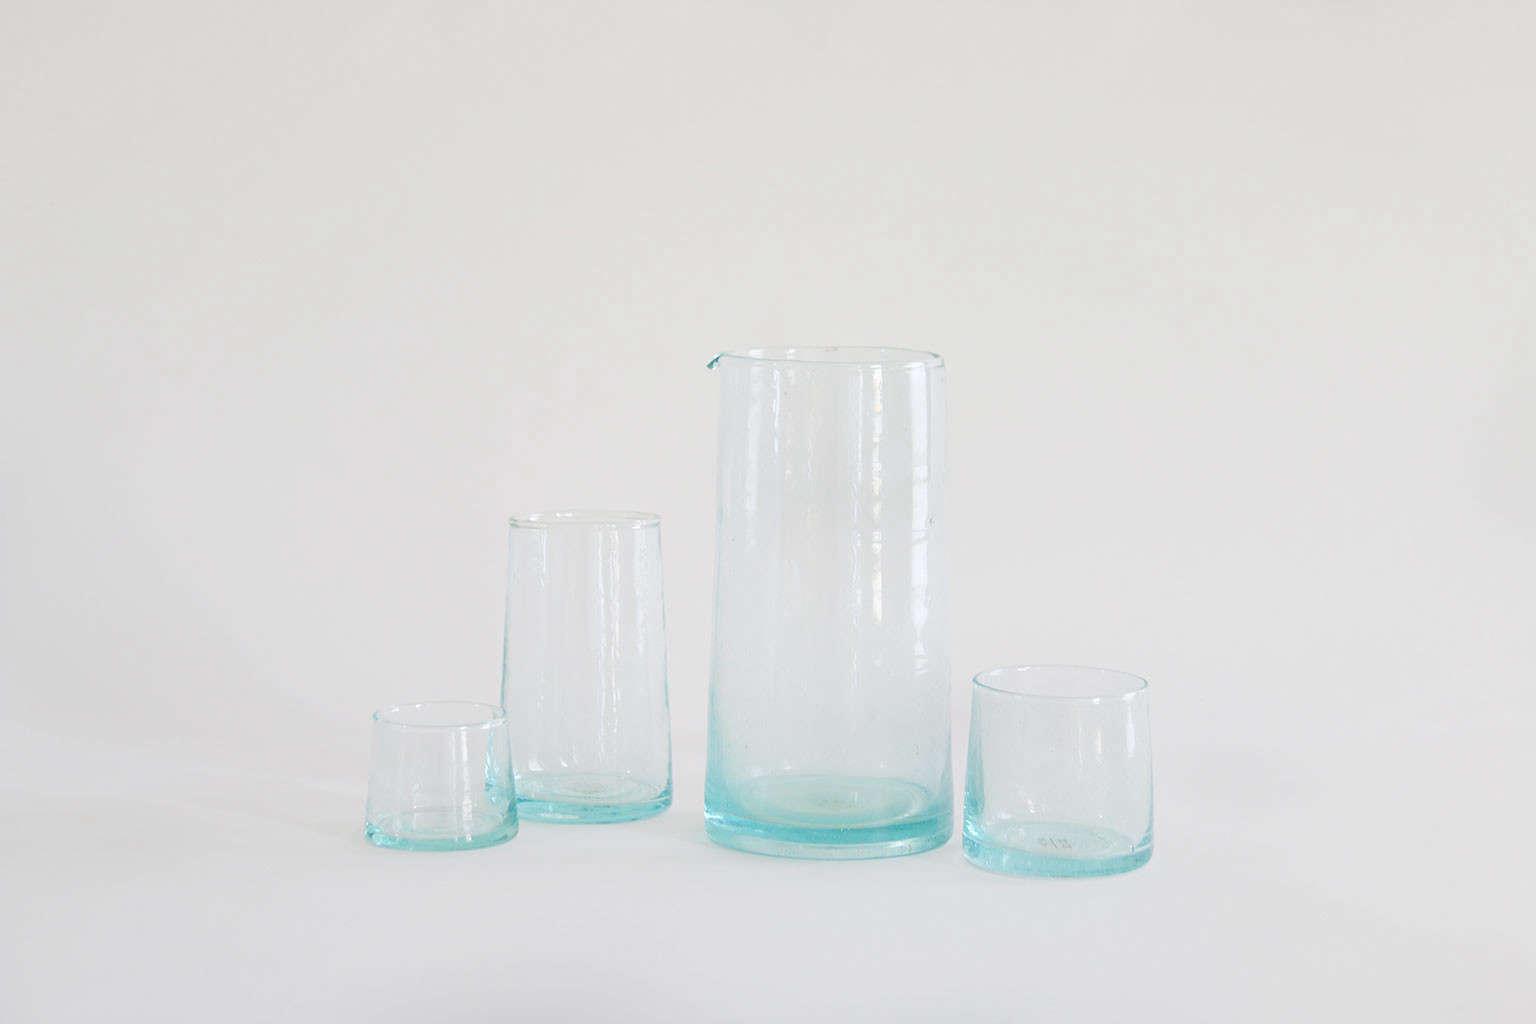 Hawkins New York Recycled Glassware